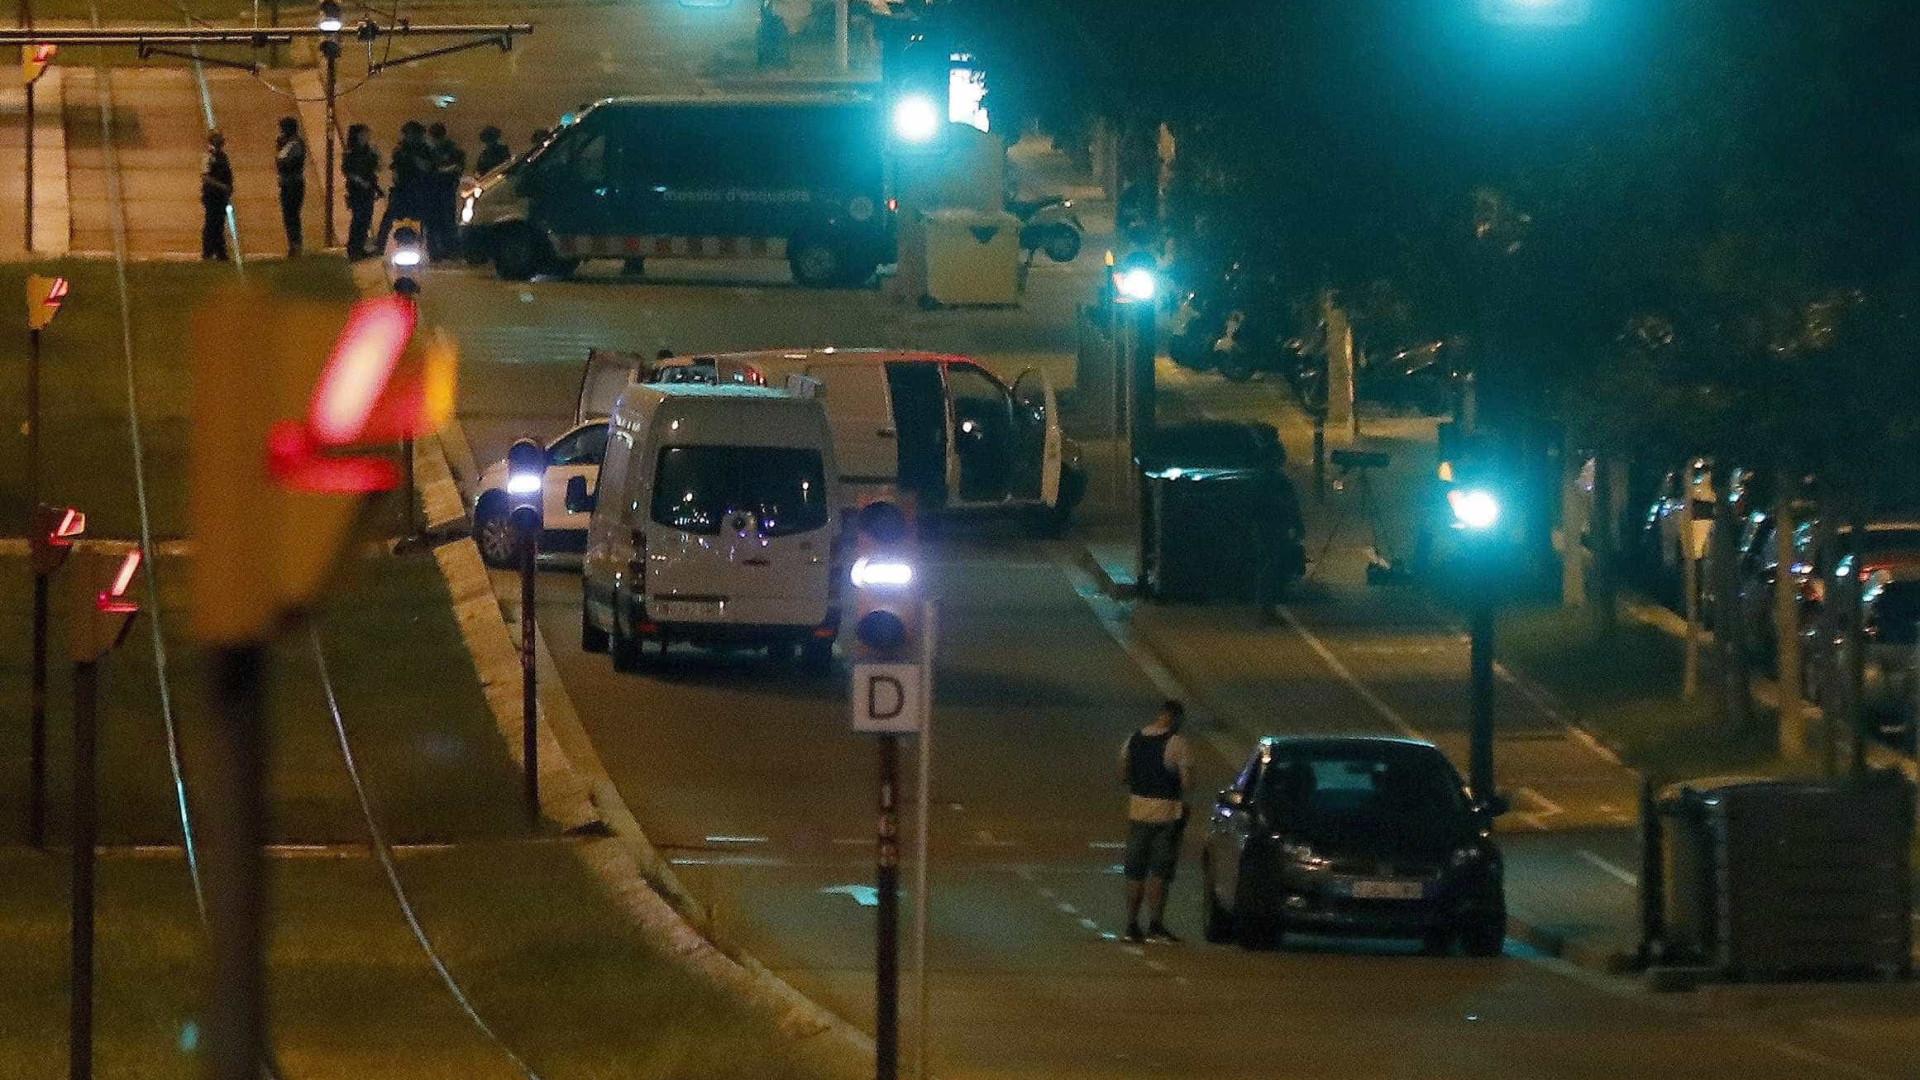 Barcelona: Portuguesa de 74 anos entre as vítimas. Neta está desaparecida